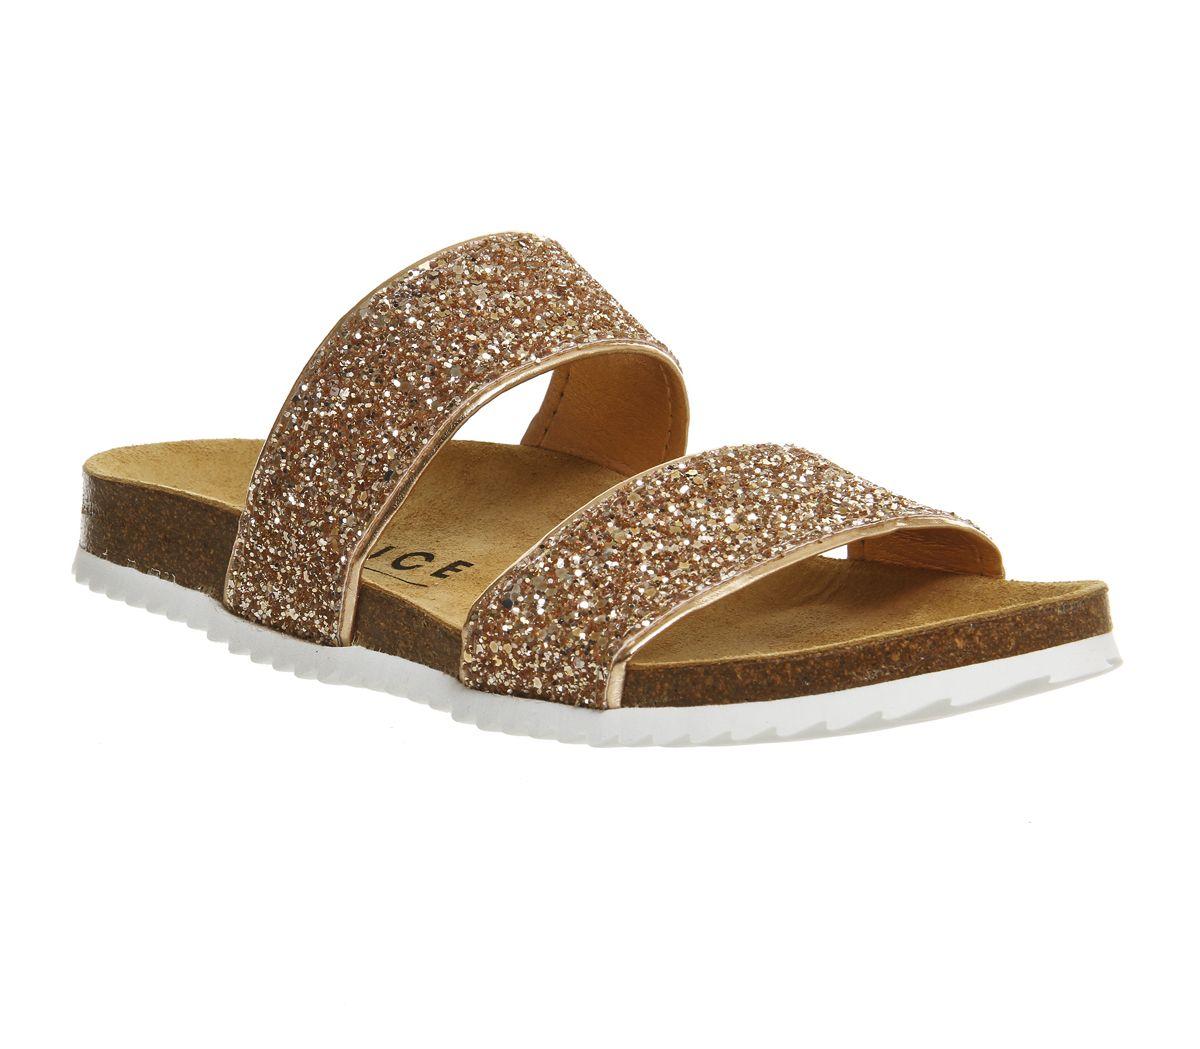 d7e031c55 Office Oslo 2 Sandals Rose Gold Glitter - Sandals